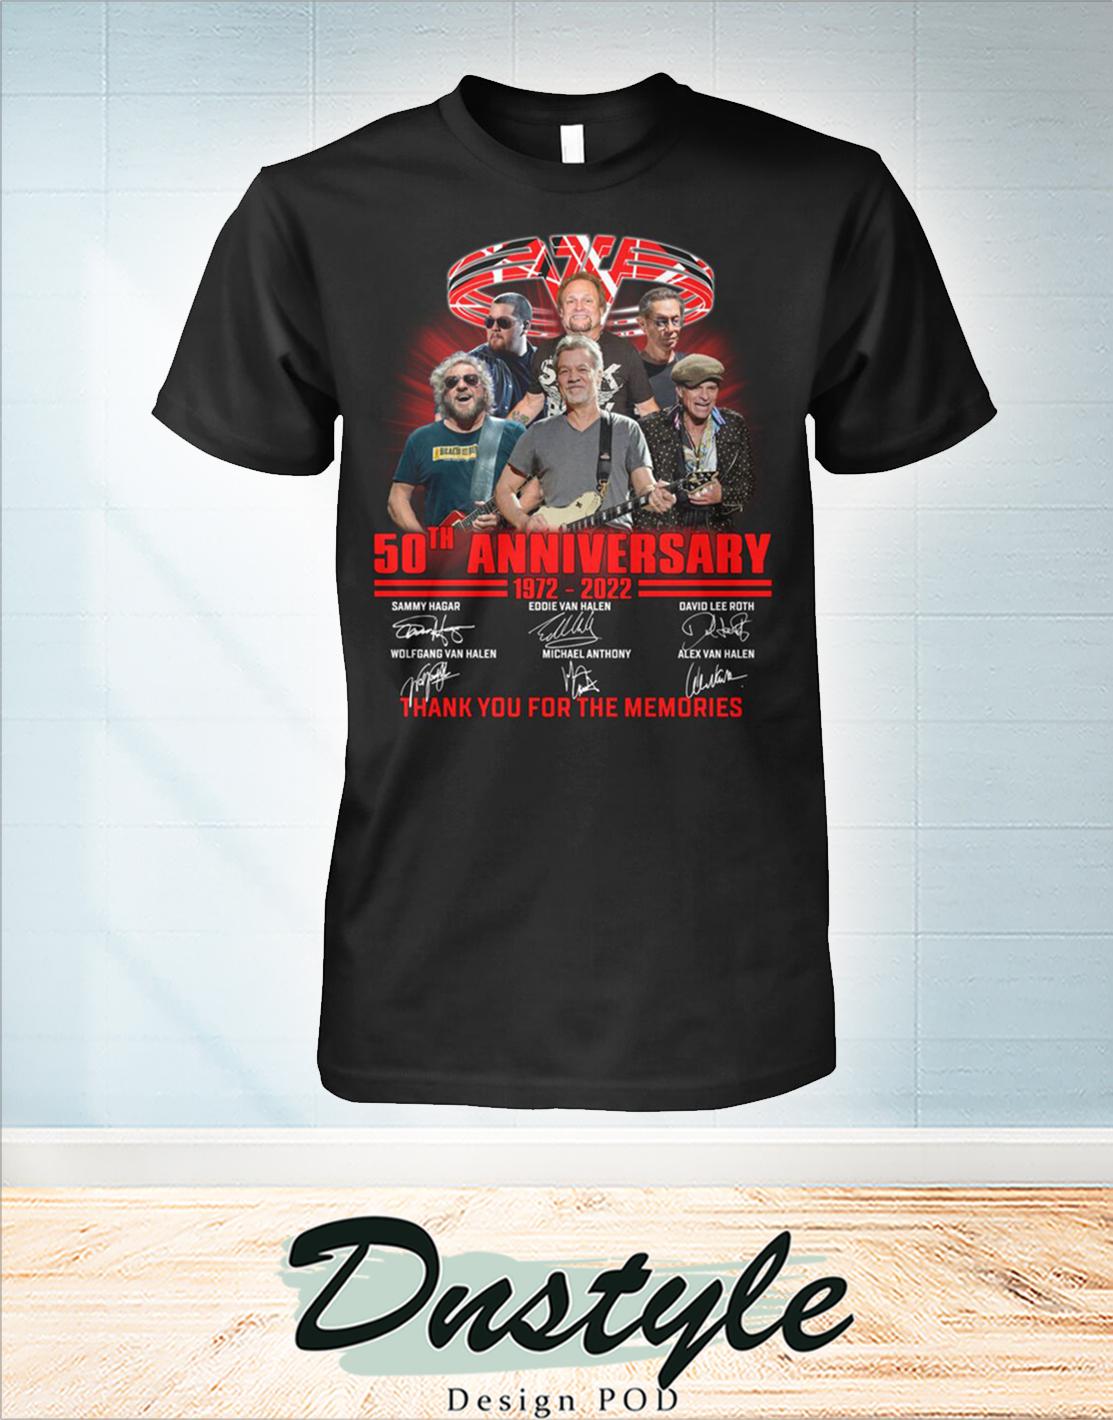 Van Halen 50th 1972 2022 anniversary thanks you for the memories shirt